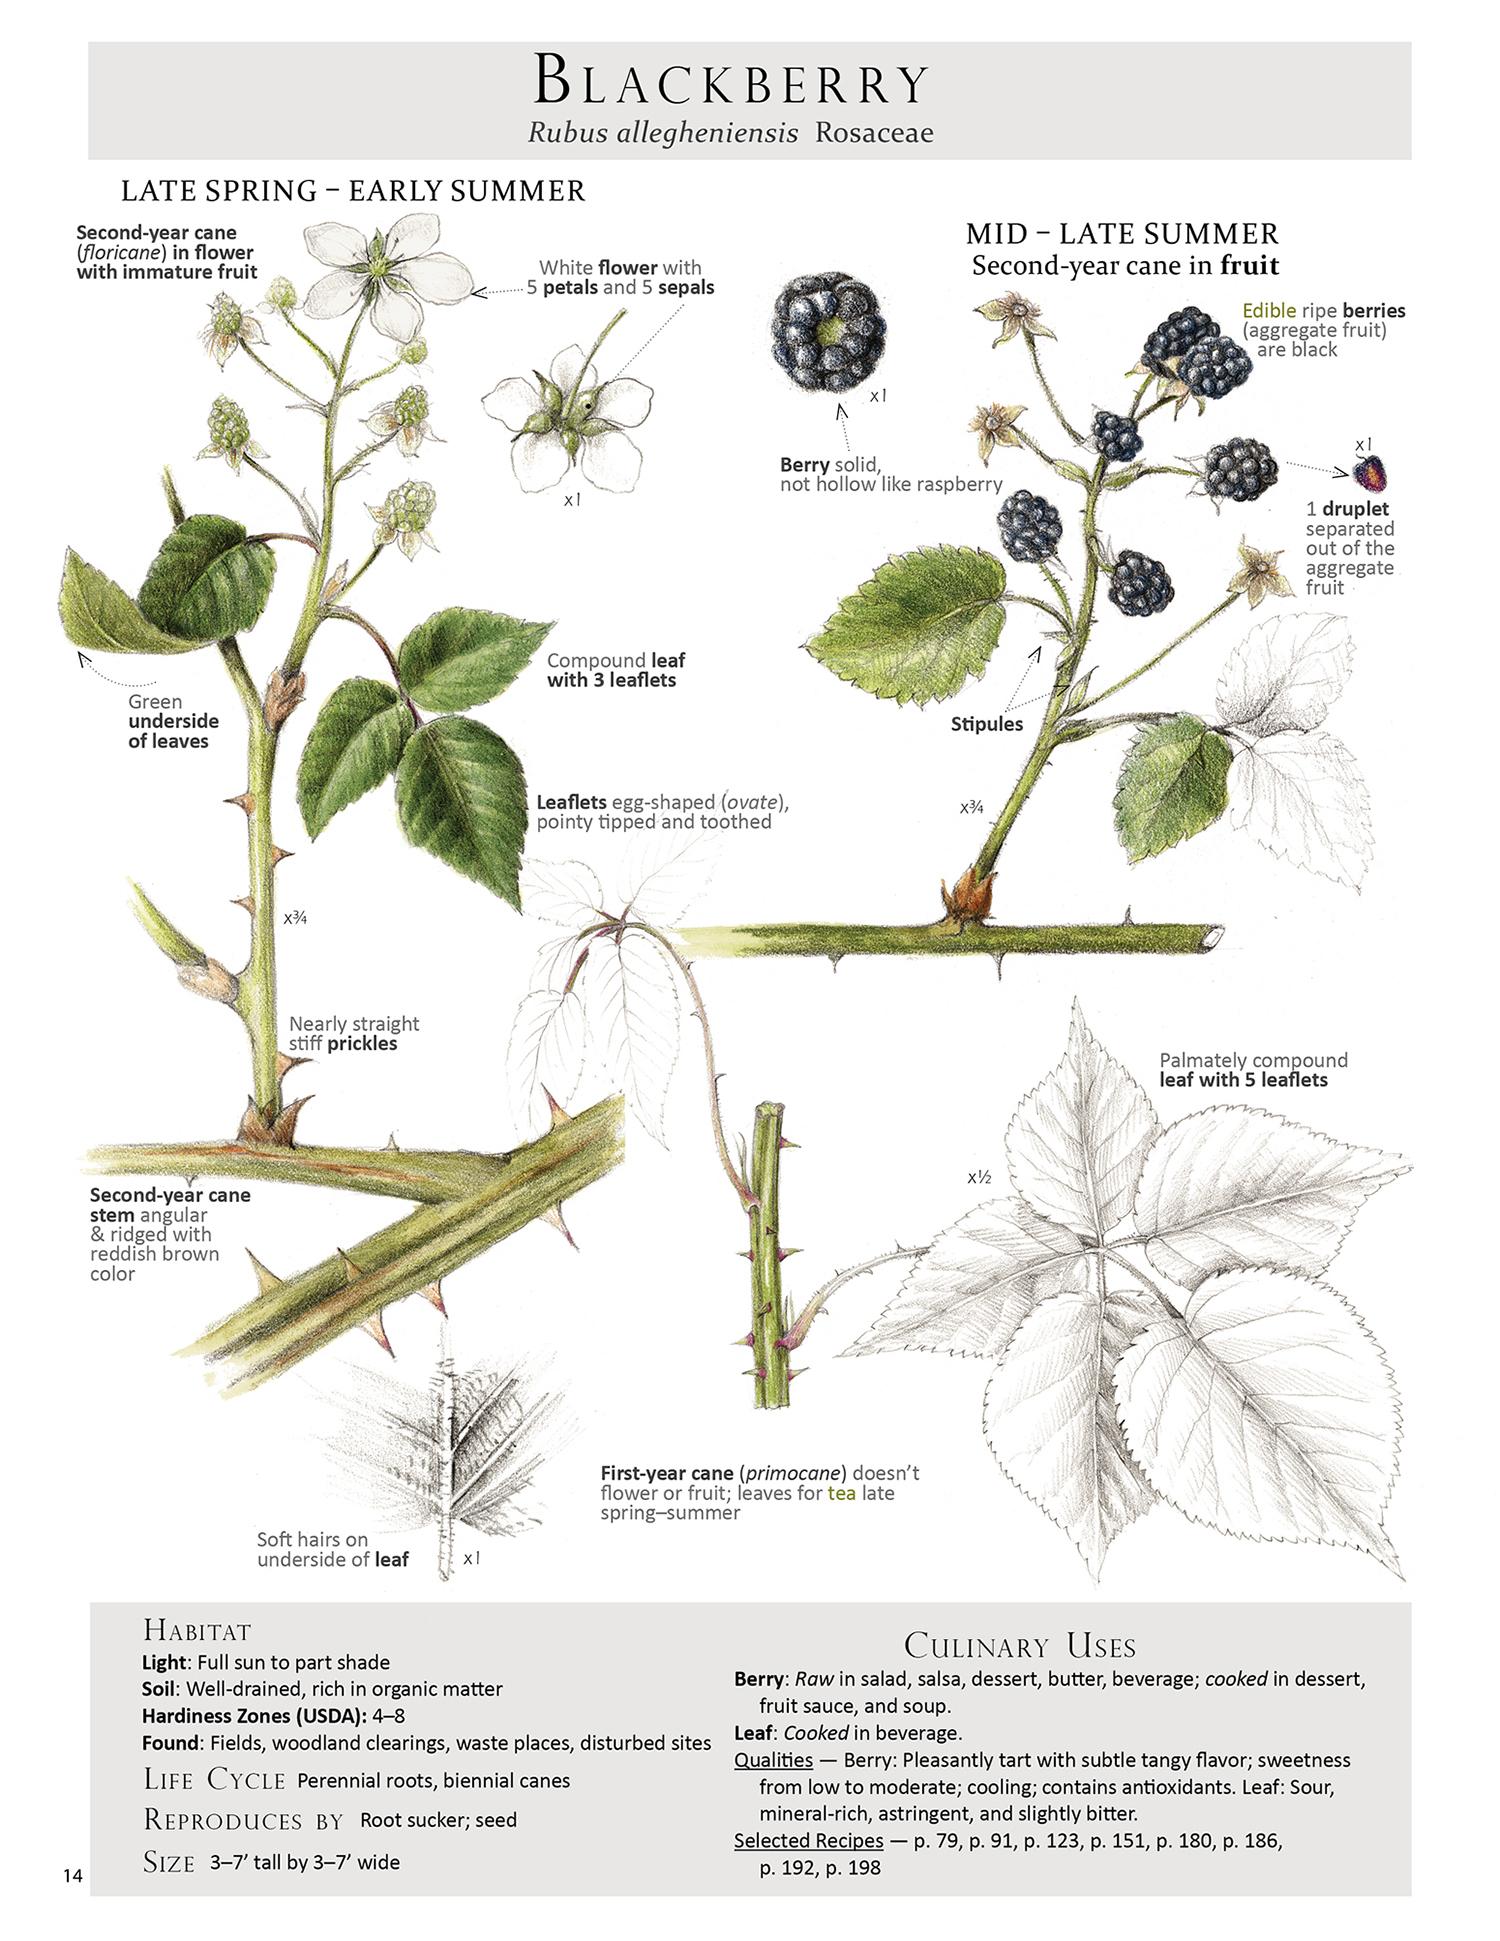 Blackberry - Rubus allegheniensis